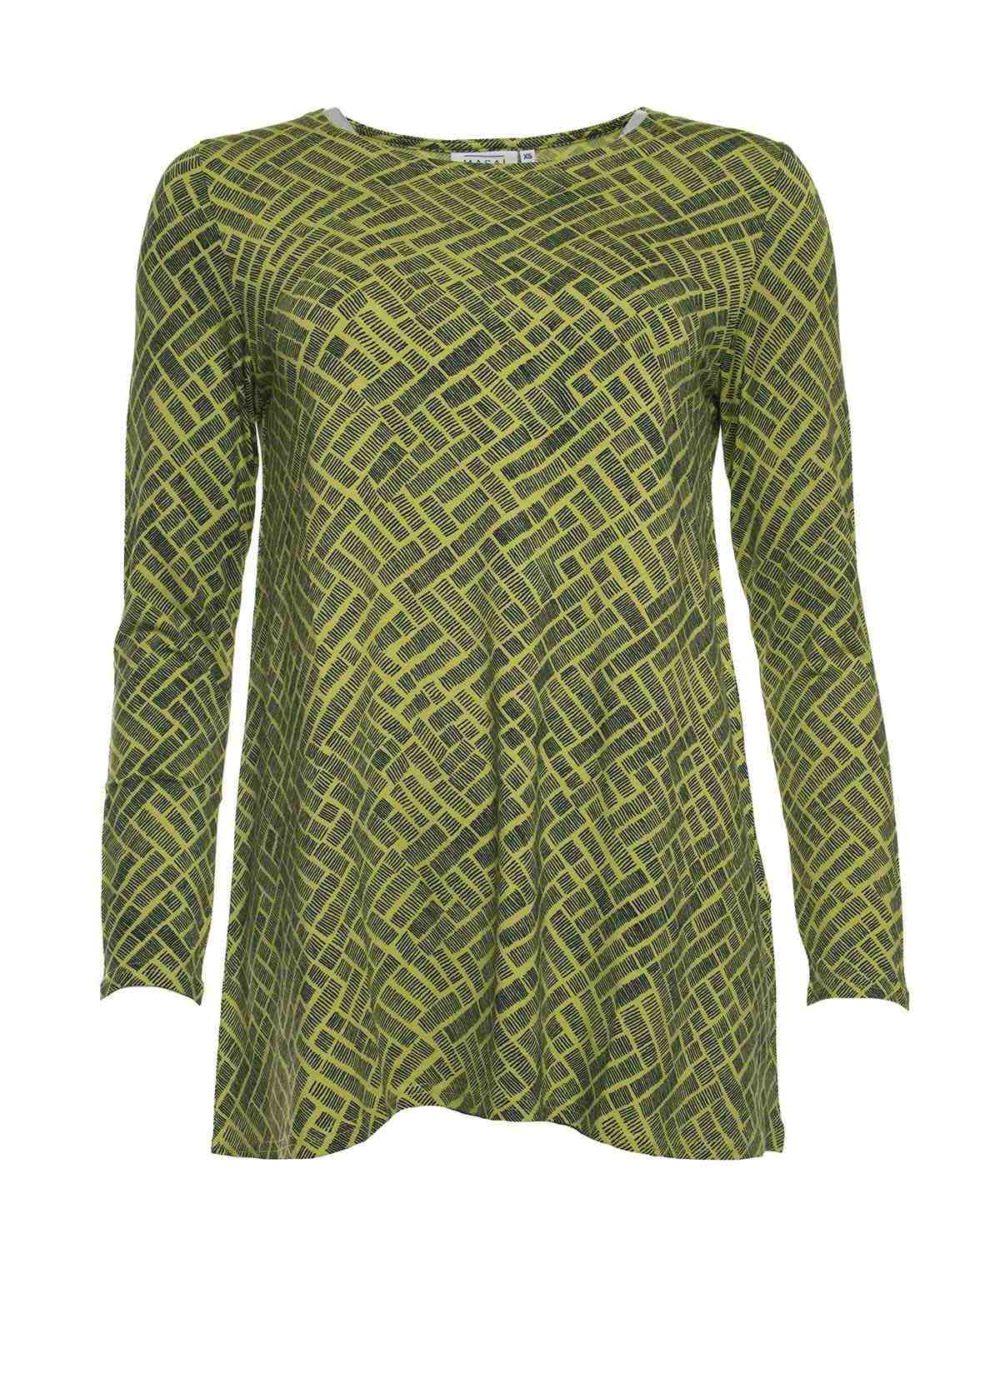 Delfa Top Masai Clothing Katie Kerr Women's Clothing